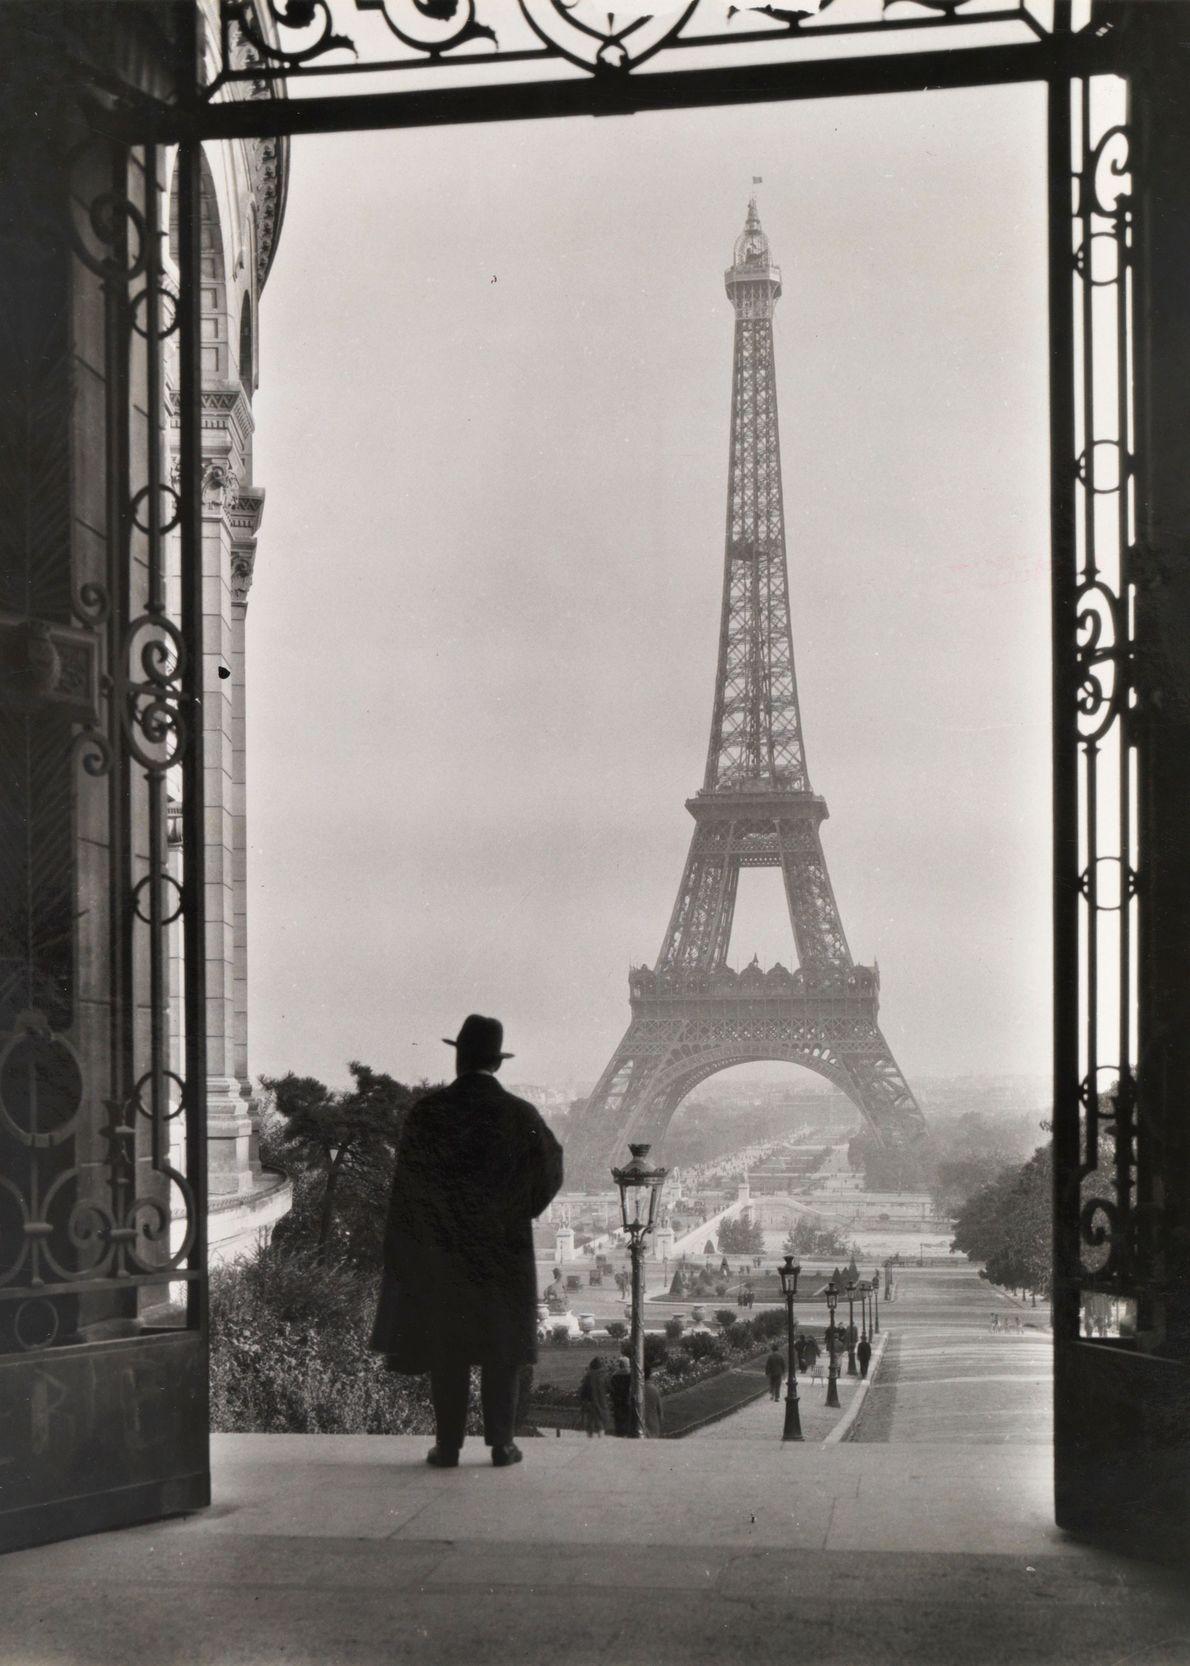 Paris, França: 1929